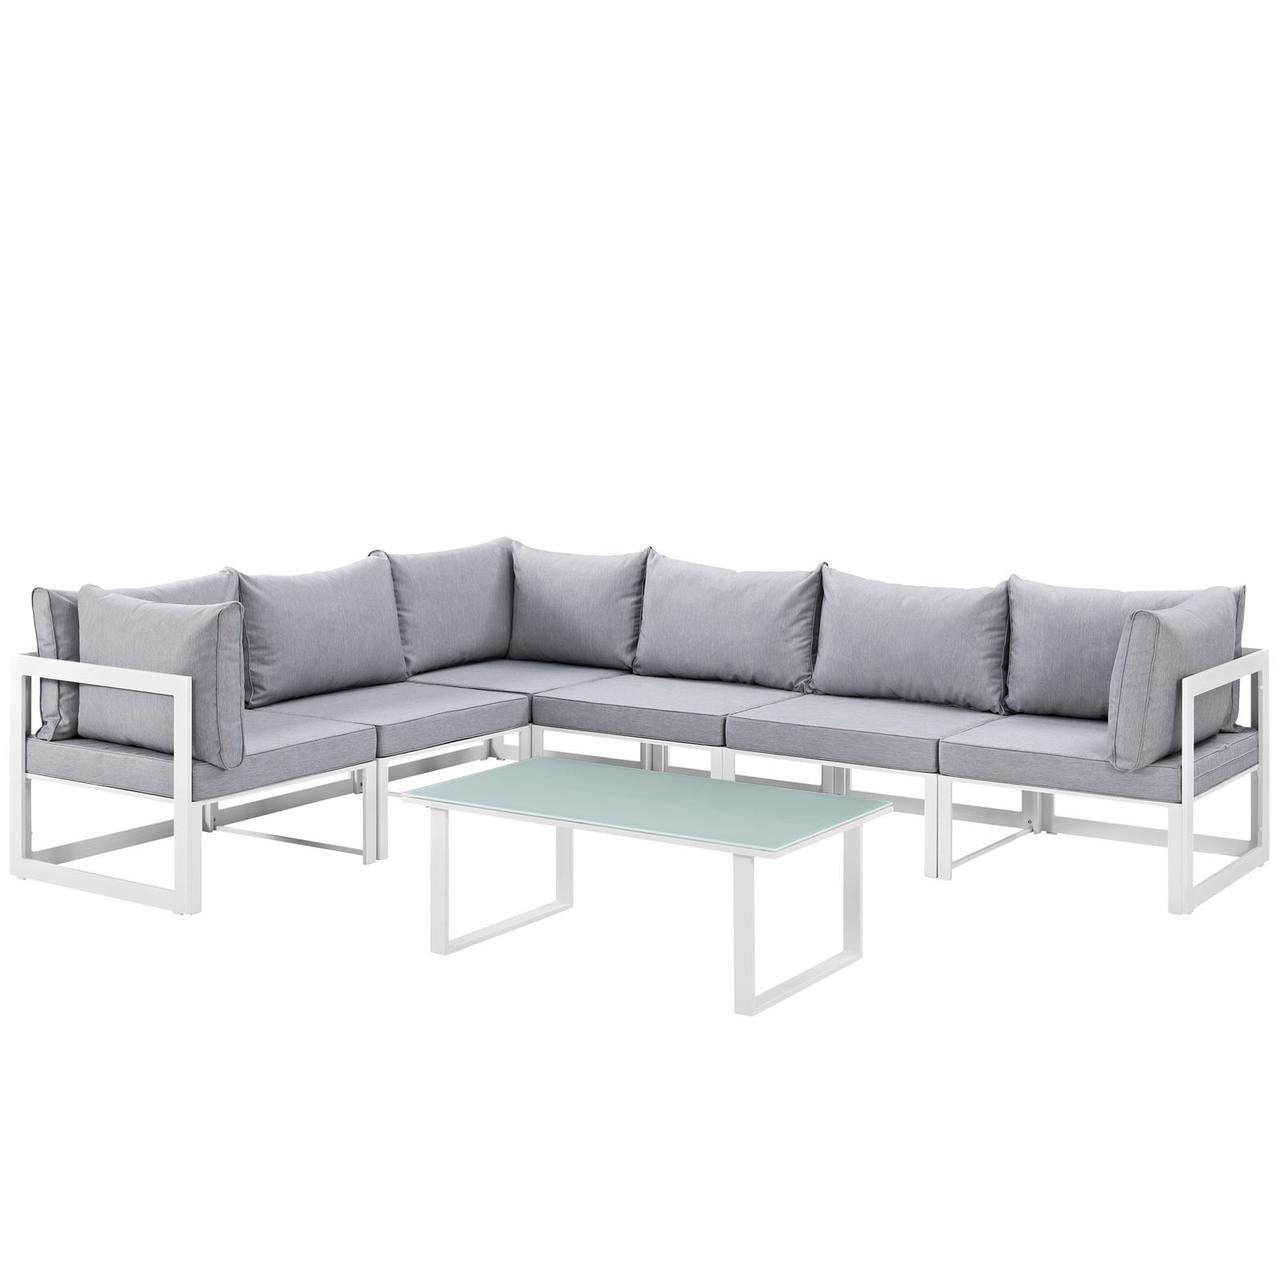 Fortuna 7 Piece Outdoor Patio Sectional Sofa Set, Steel ...